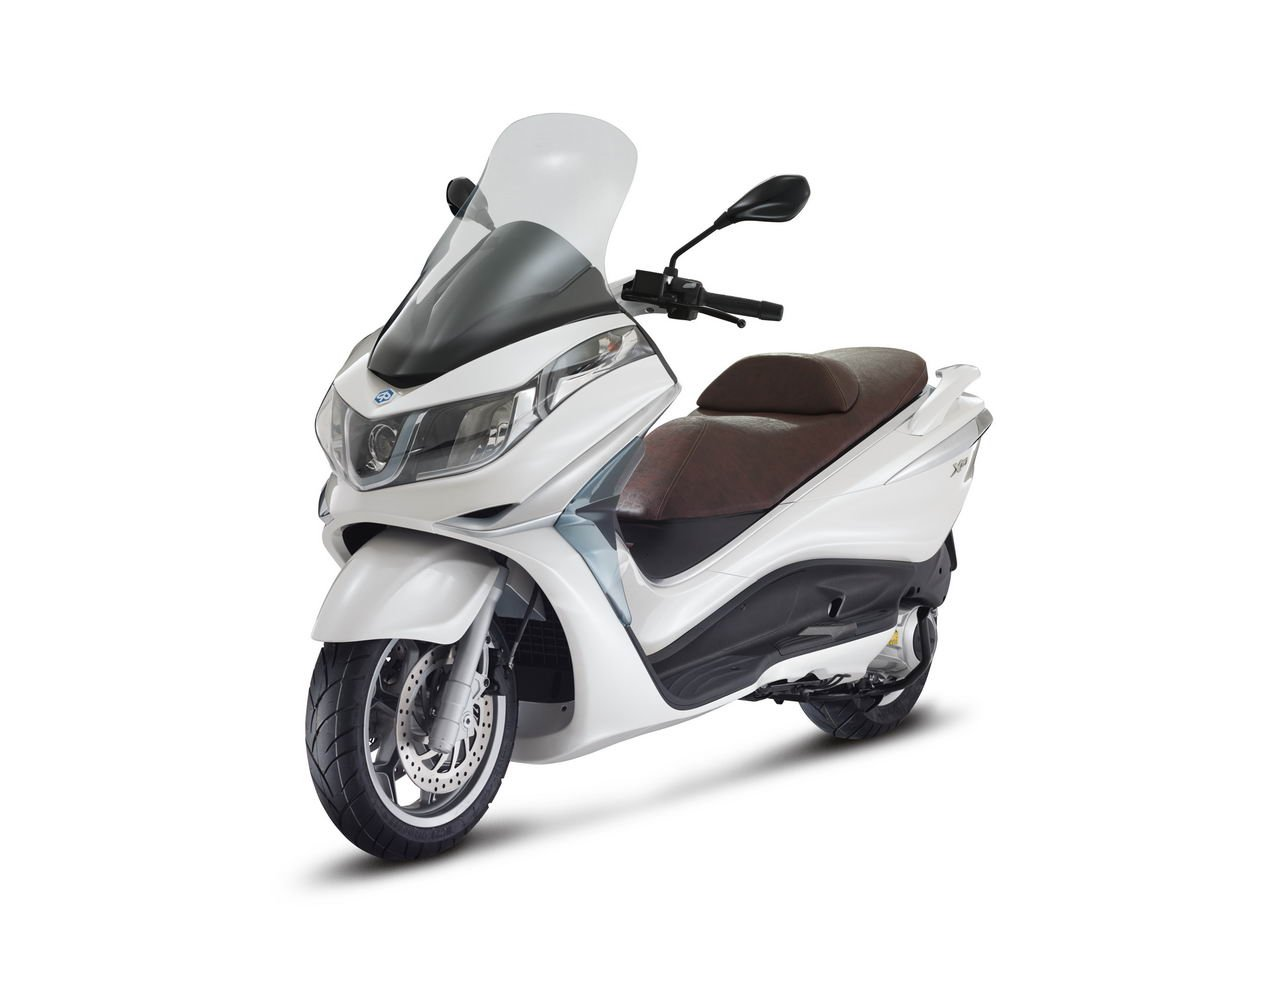 Listino Piaggio Liberty 50 2T Teens Scooter 50 - image 15140_piaggio-x10-350 on http://moto.motori.net